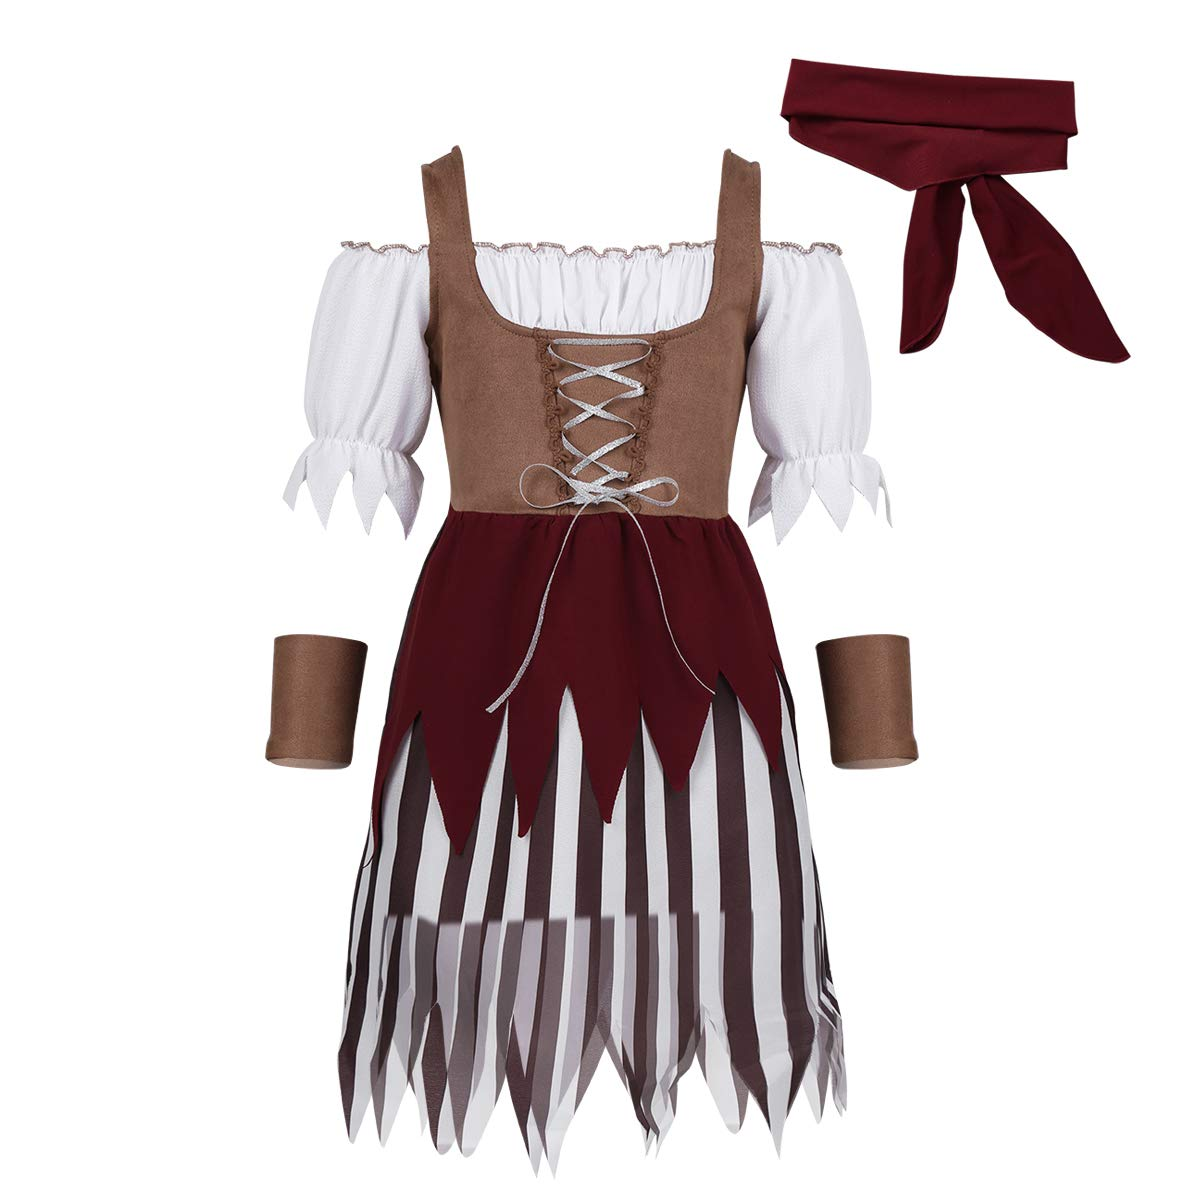 zdhoor Kids Girls 3PCS Pirate Buccaneer Halloween Costume Off Shoulder Princess Dress with Head Scarf Wristband Set